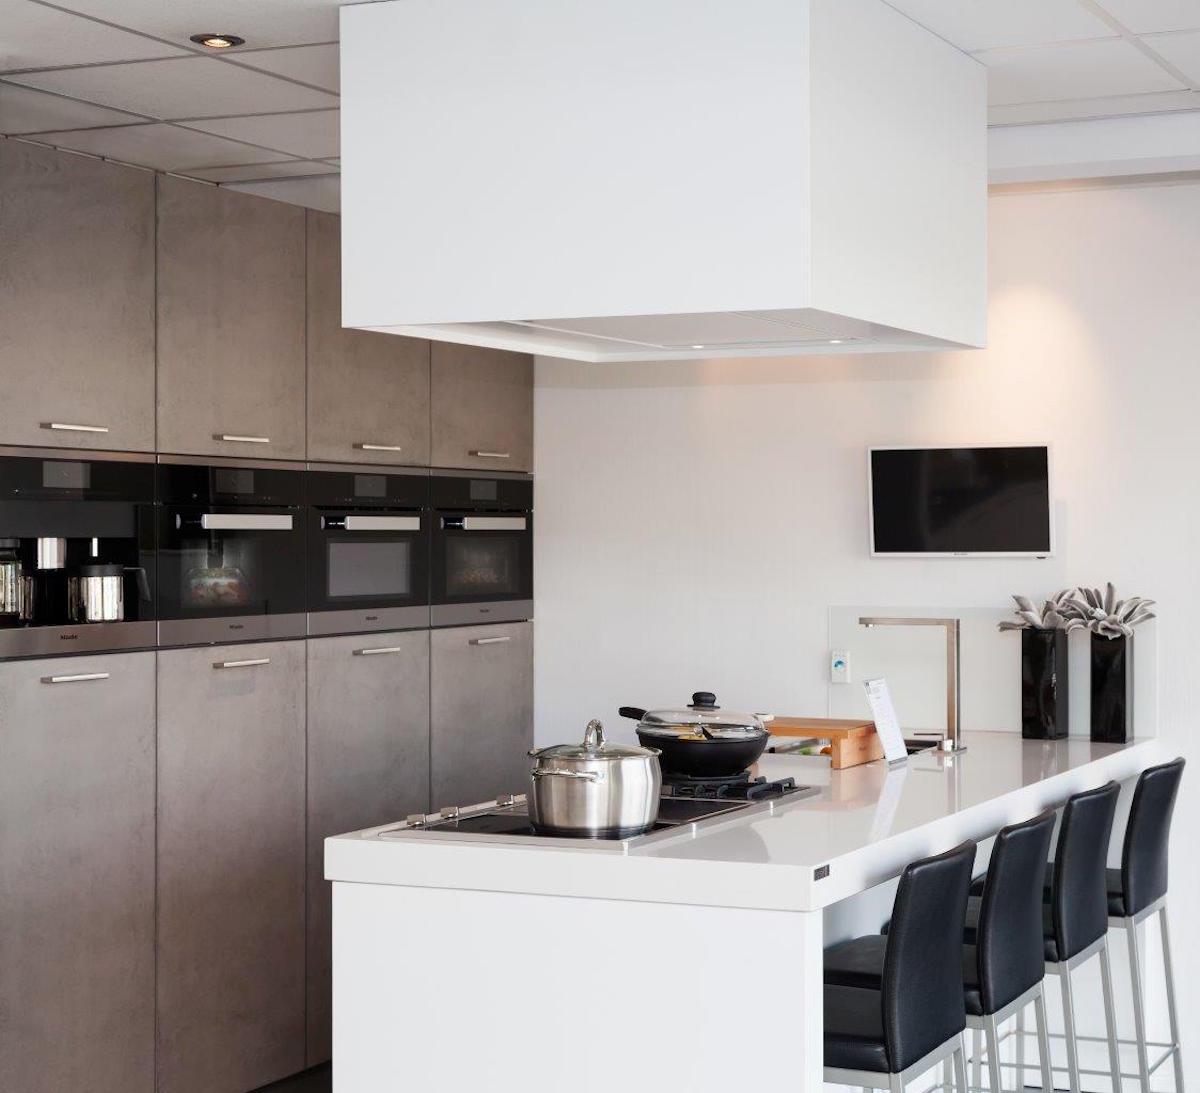 Moderne keuken met it kookeiland en miele apparatuur via Van Ginkel